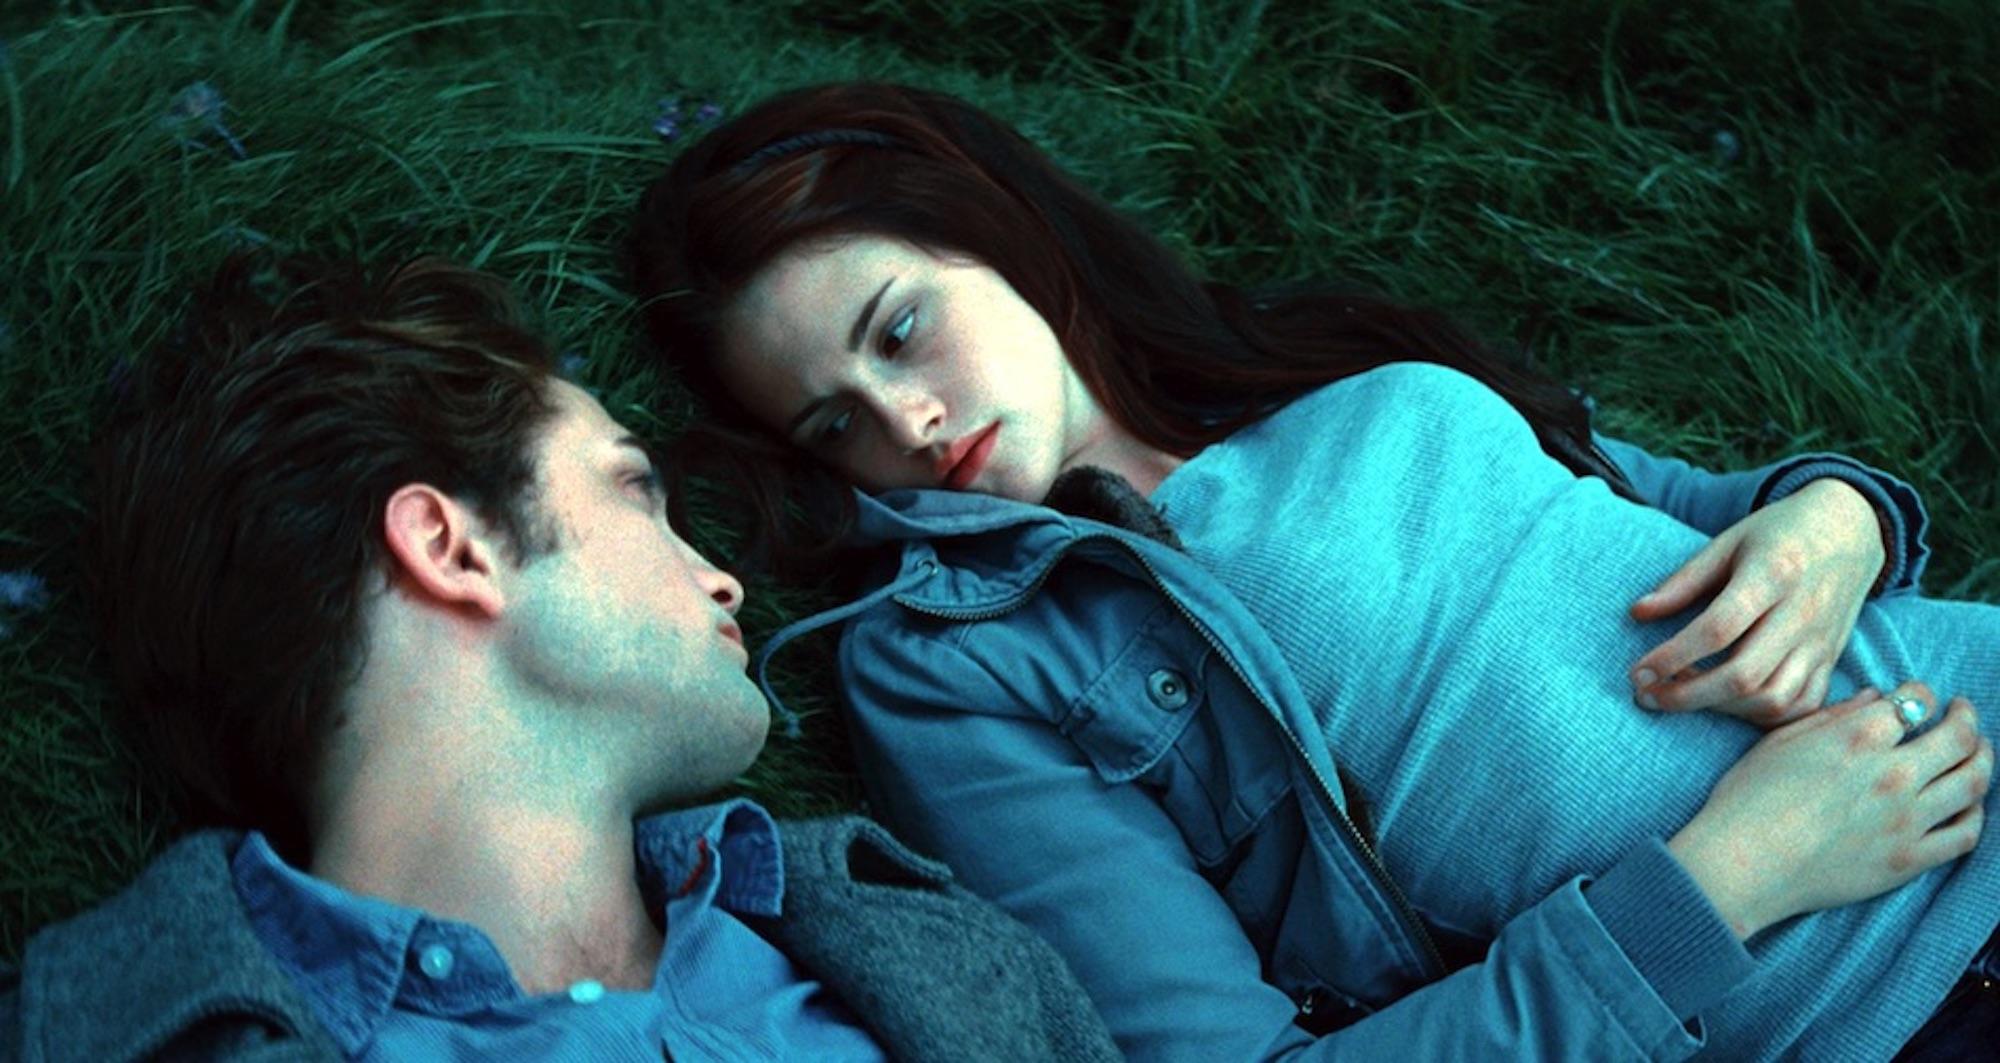 Robert Pattinson as Edward Cullen and Kristen Stewart as Bella Swan in 'Twilight'